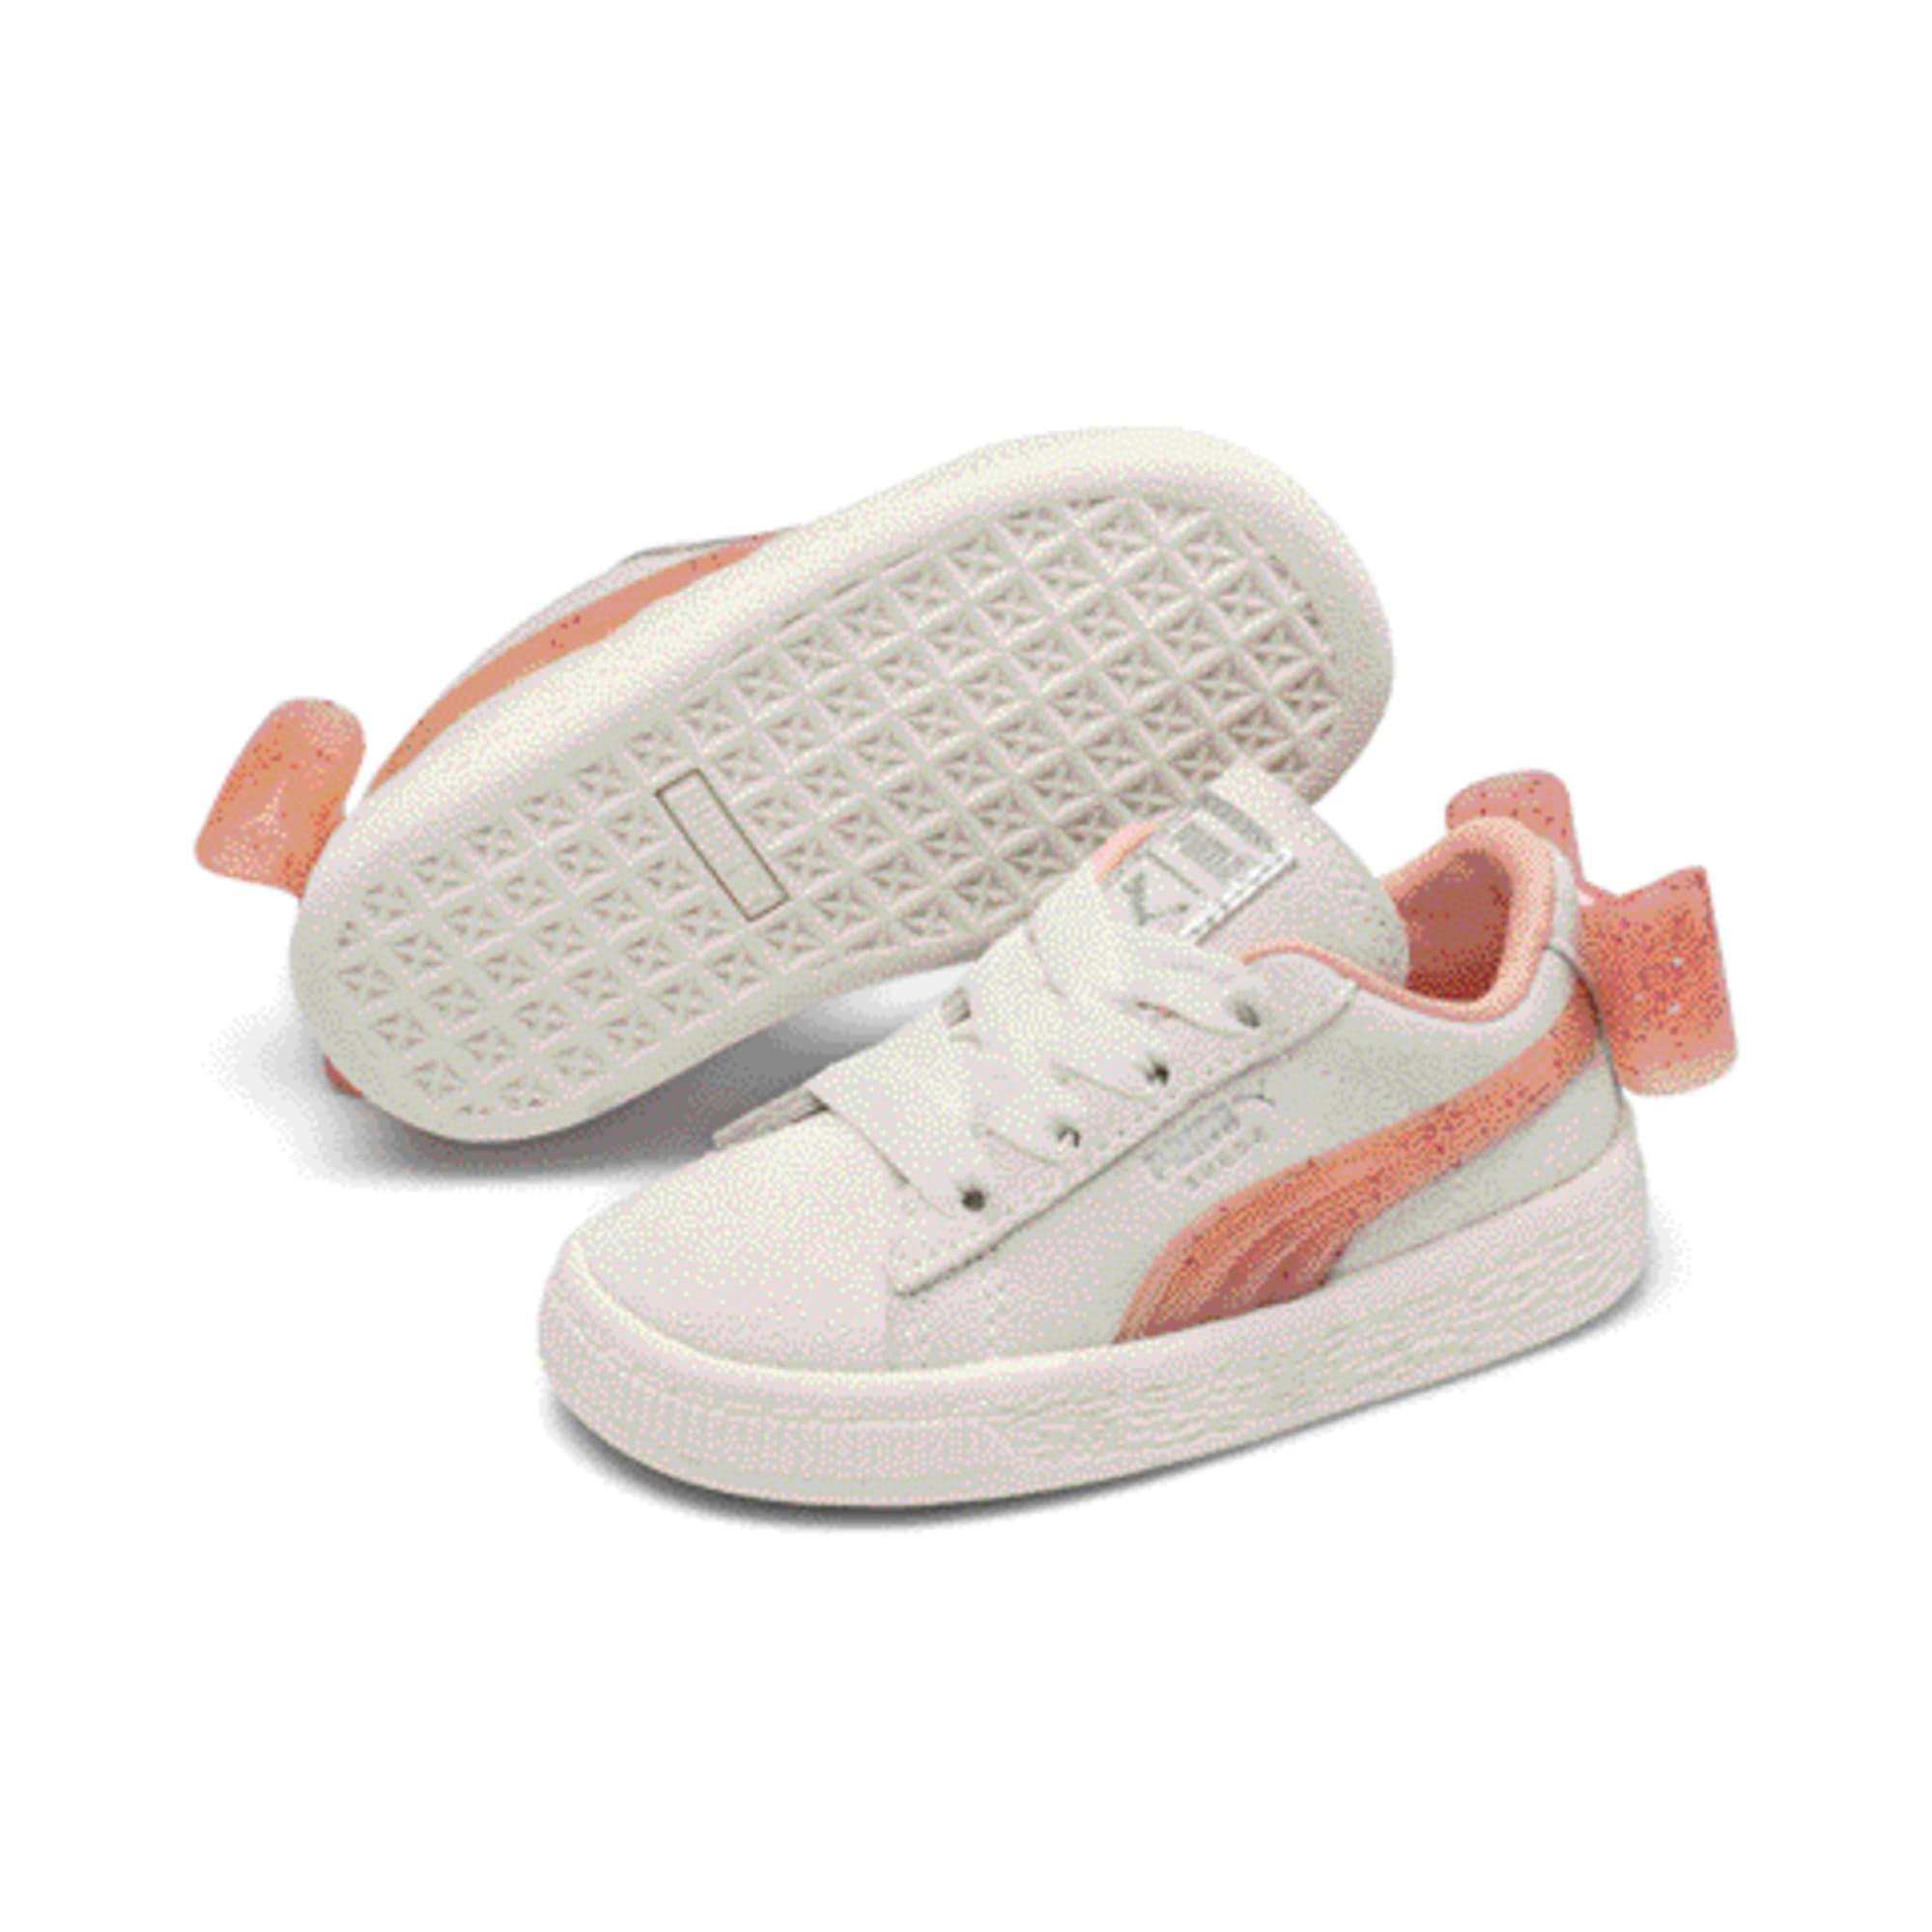 Miniatura 2 de Zapatos Suede Jelly Bow AC para bebé, White-Peach Bud-Silver, mediano